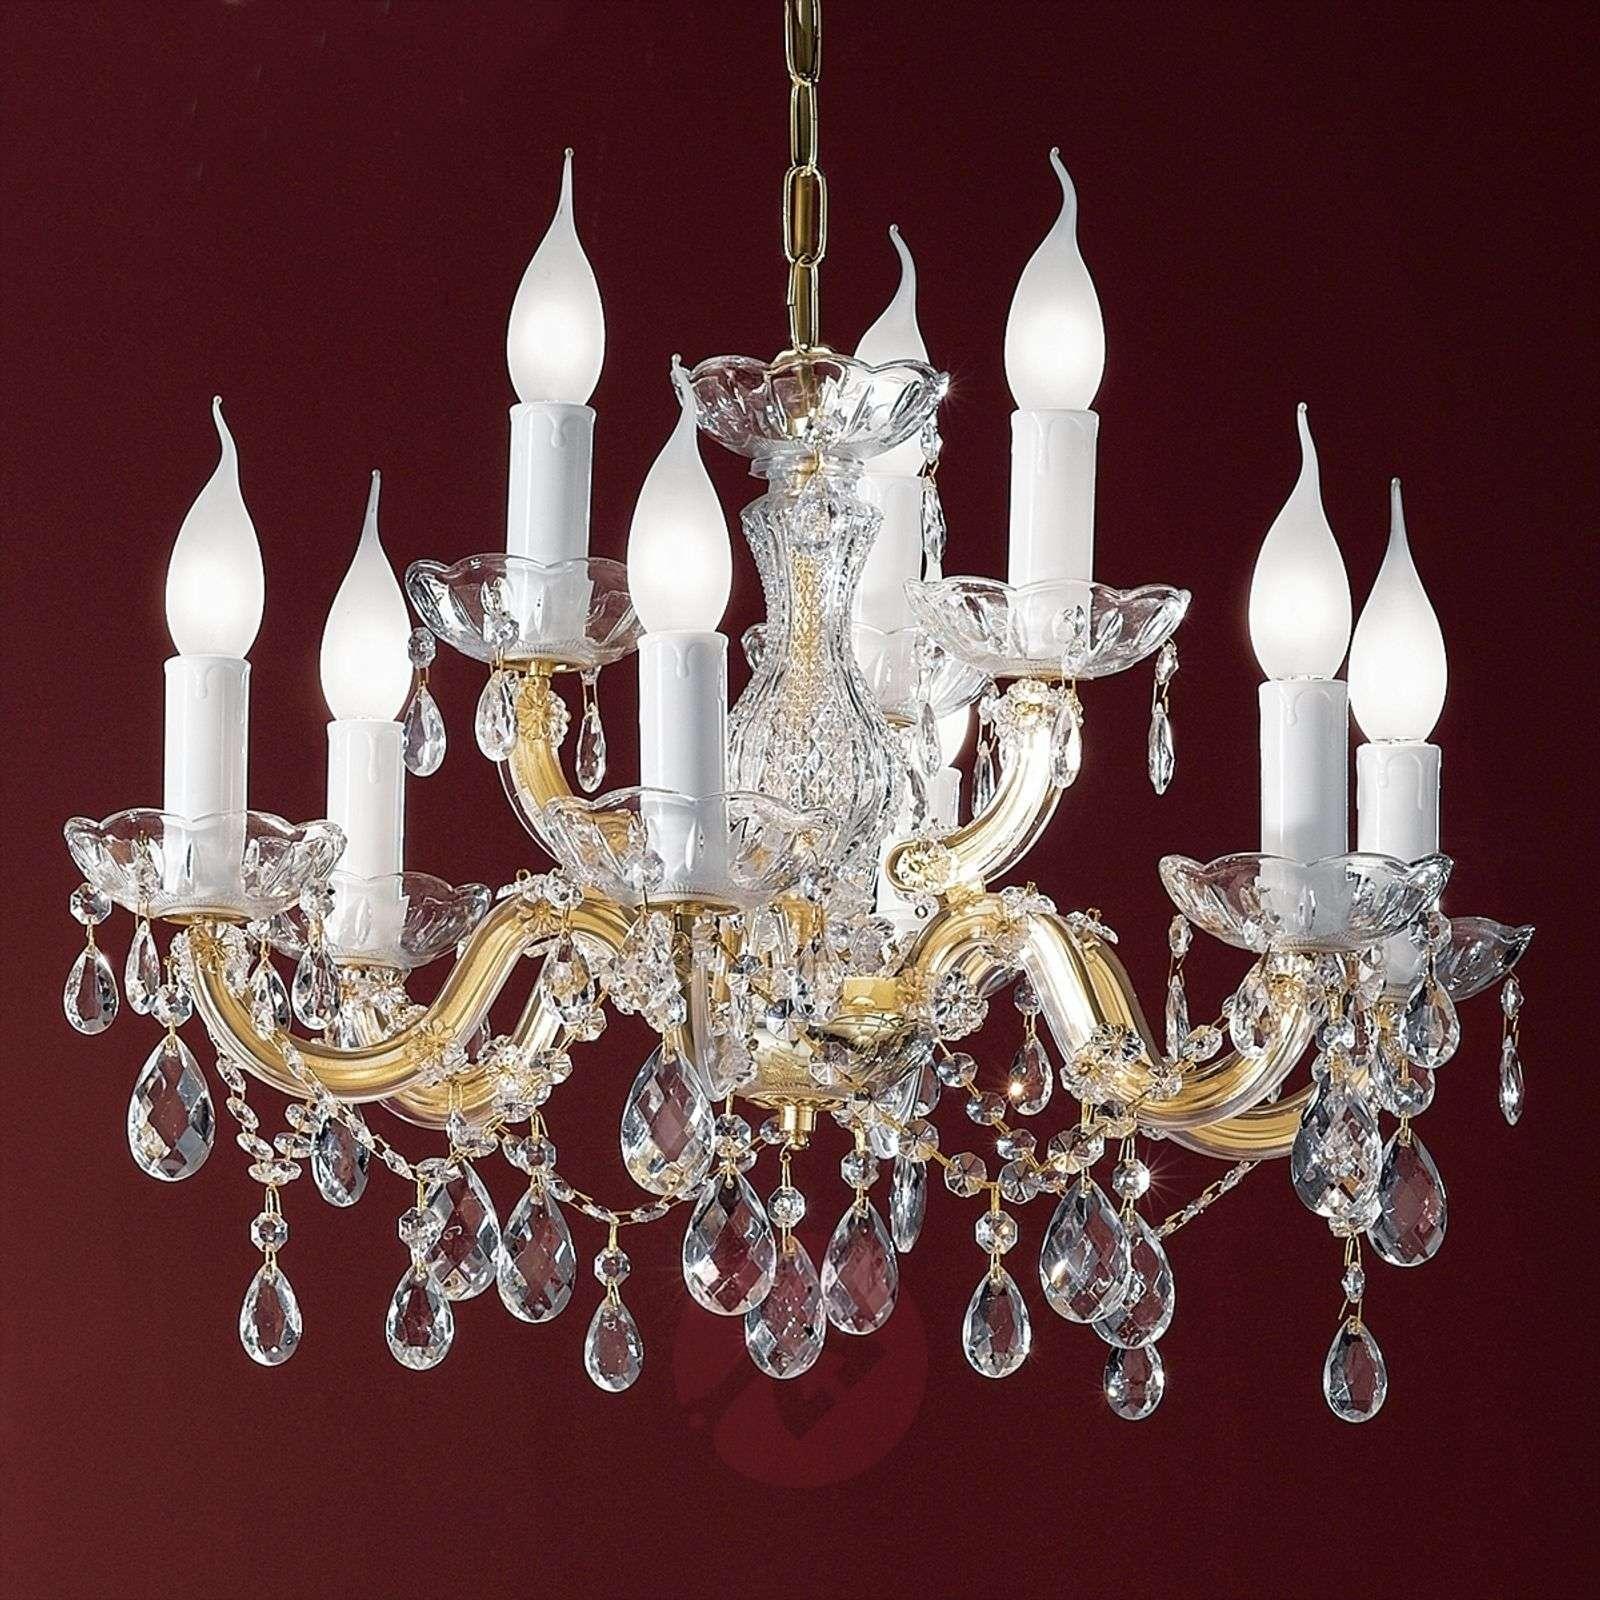 Kaunis kattokruunu DOLORES kristalleilla-7253347-01